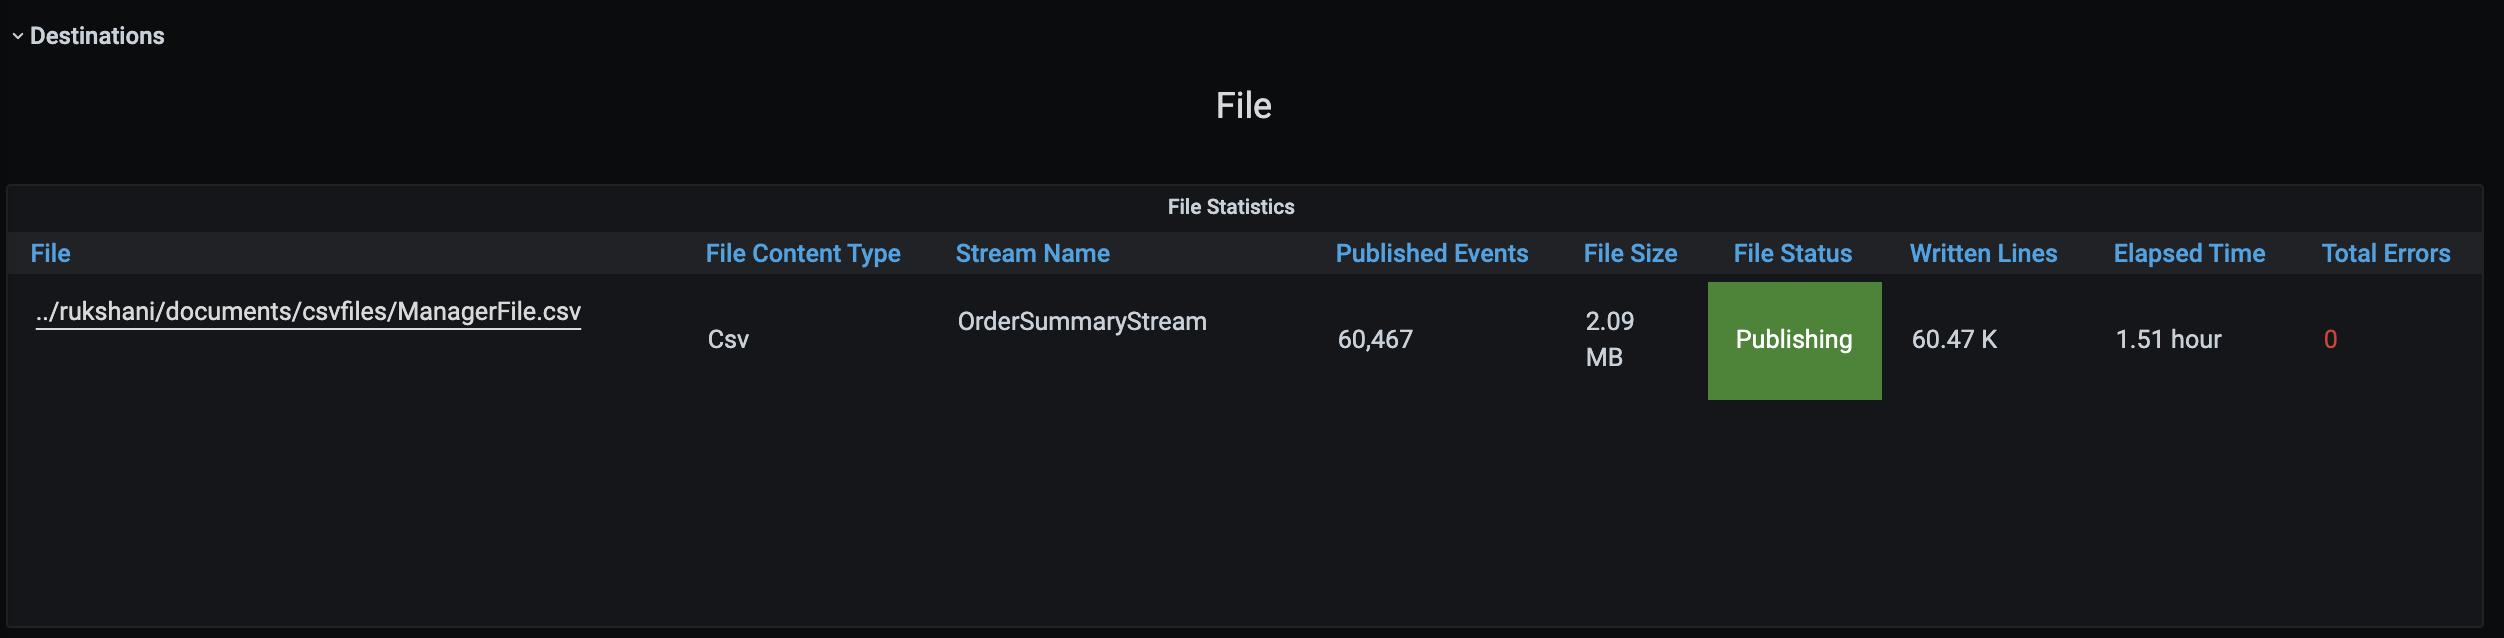 File Sink Statistics